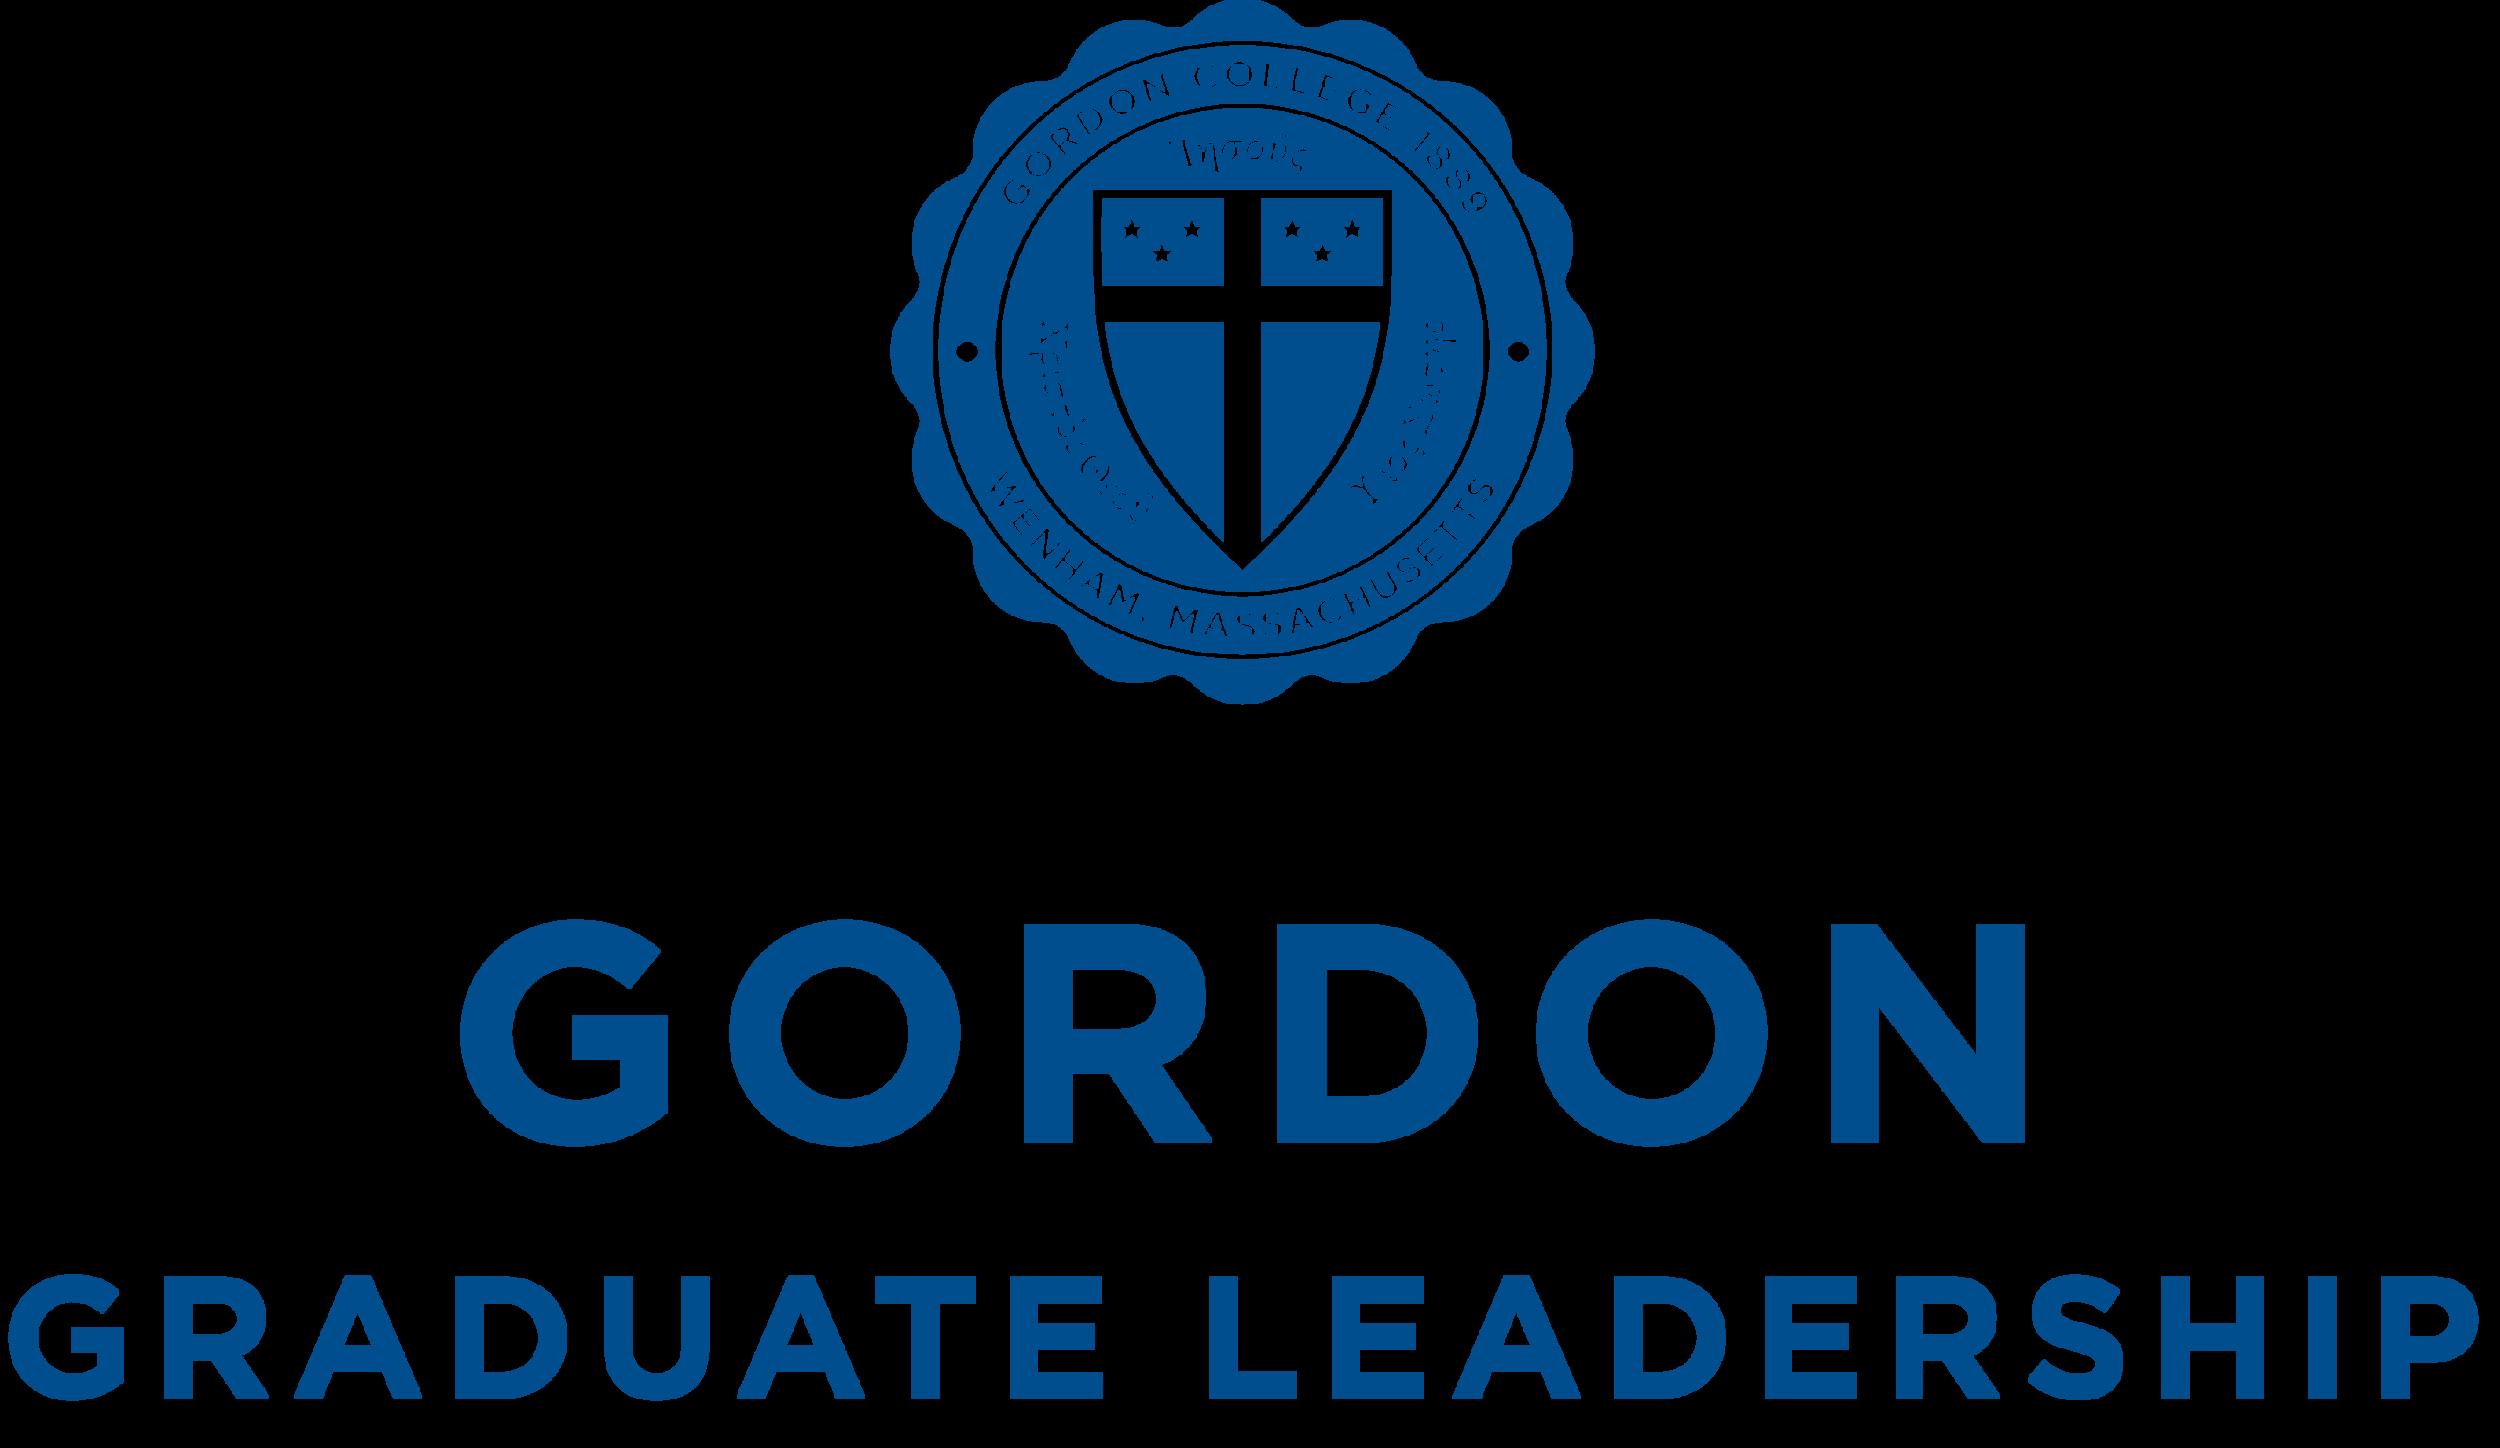 Gordon Graduate Leadership